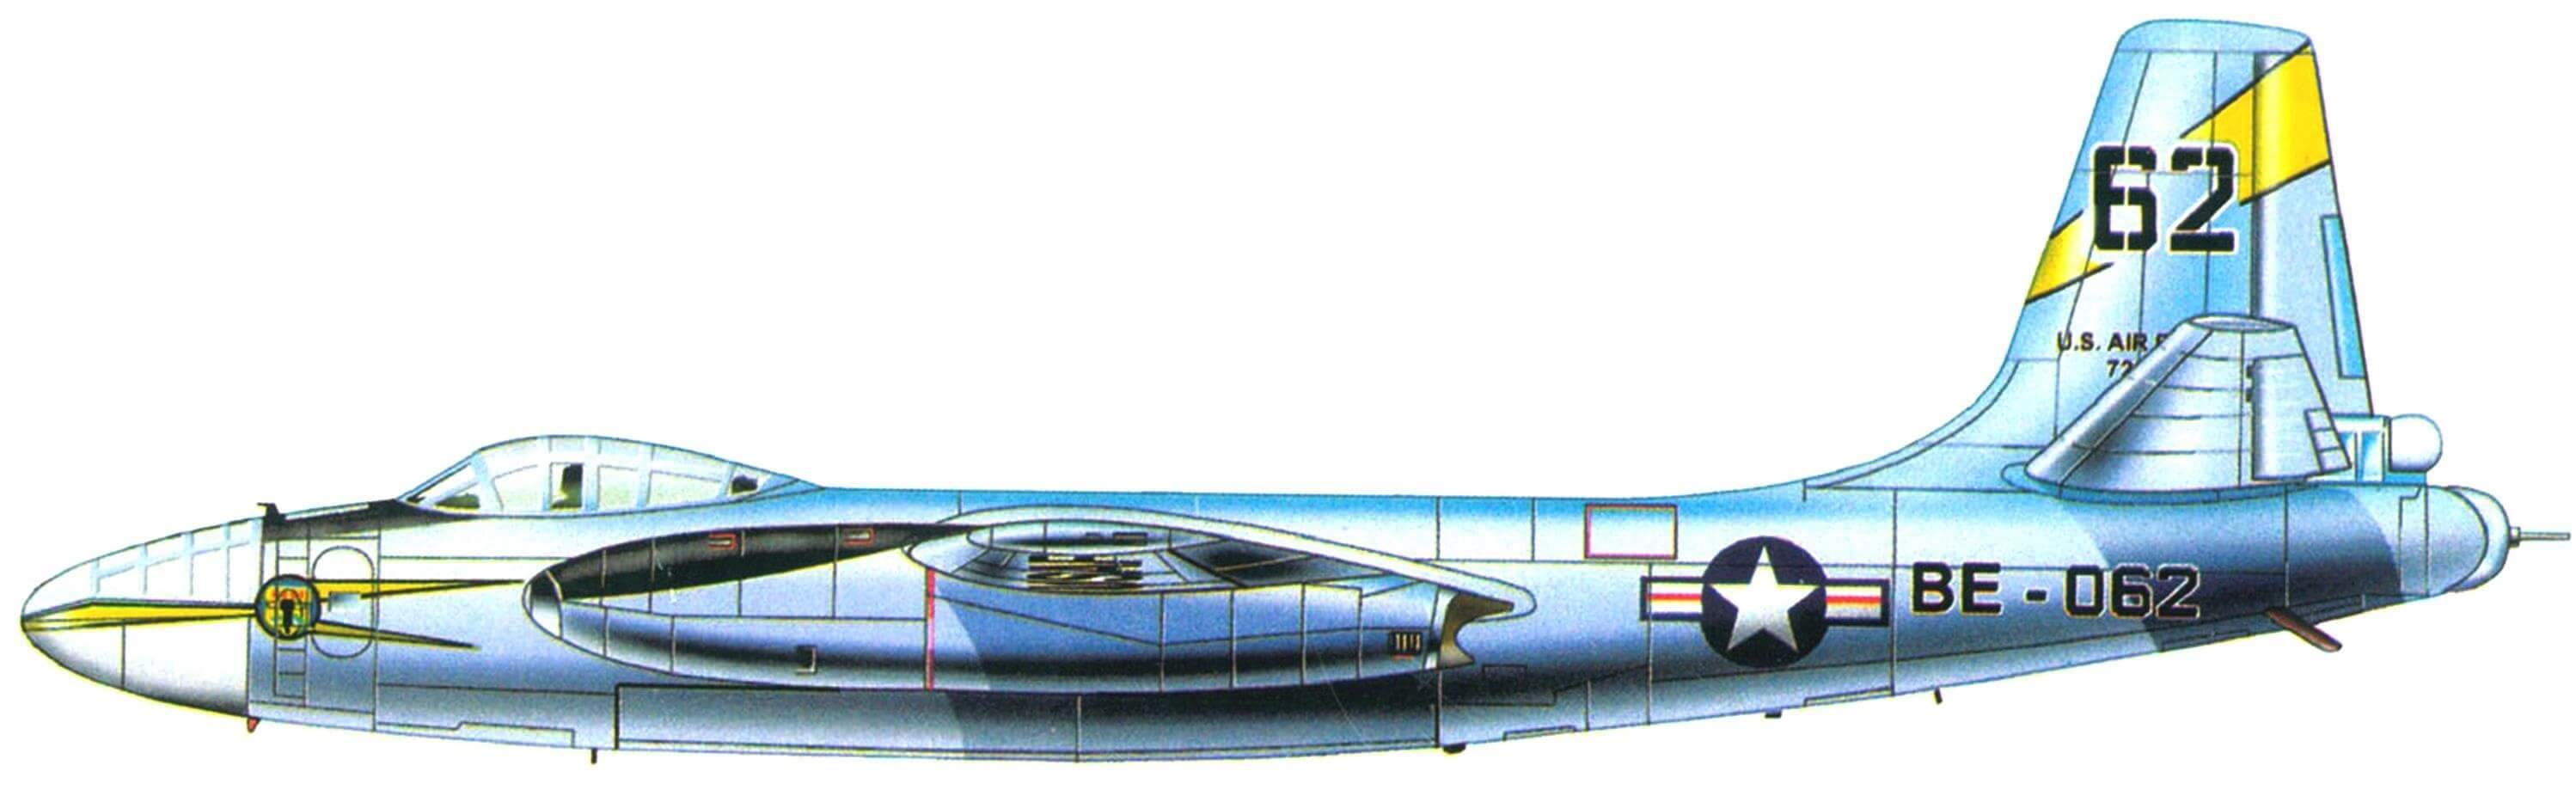 North American B-45 Tornado В-45А-5 из 85-й эскадрильи